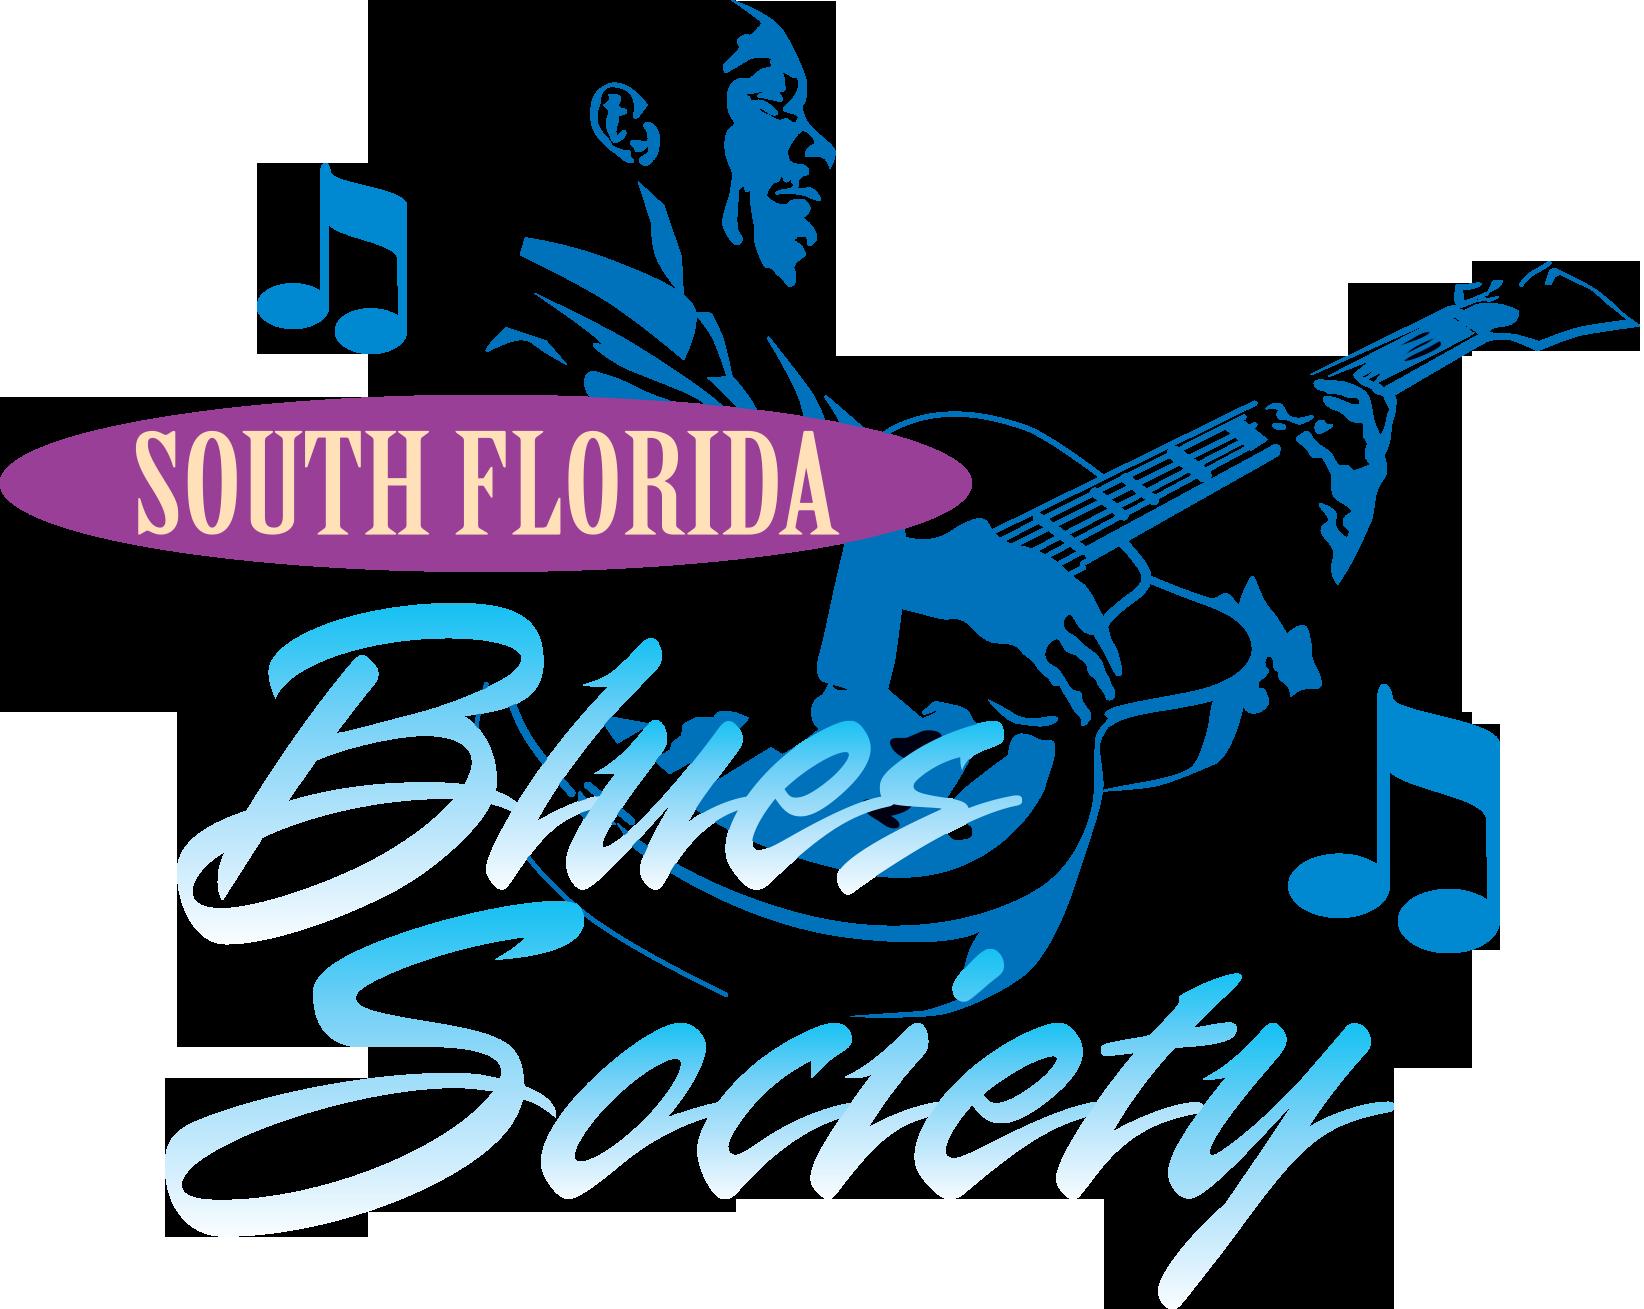 Clipart guitar laud. South florida blues society